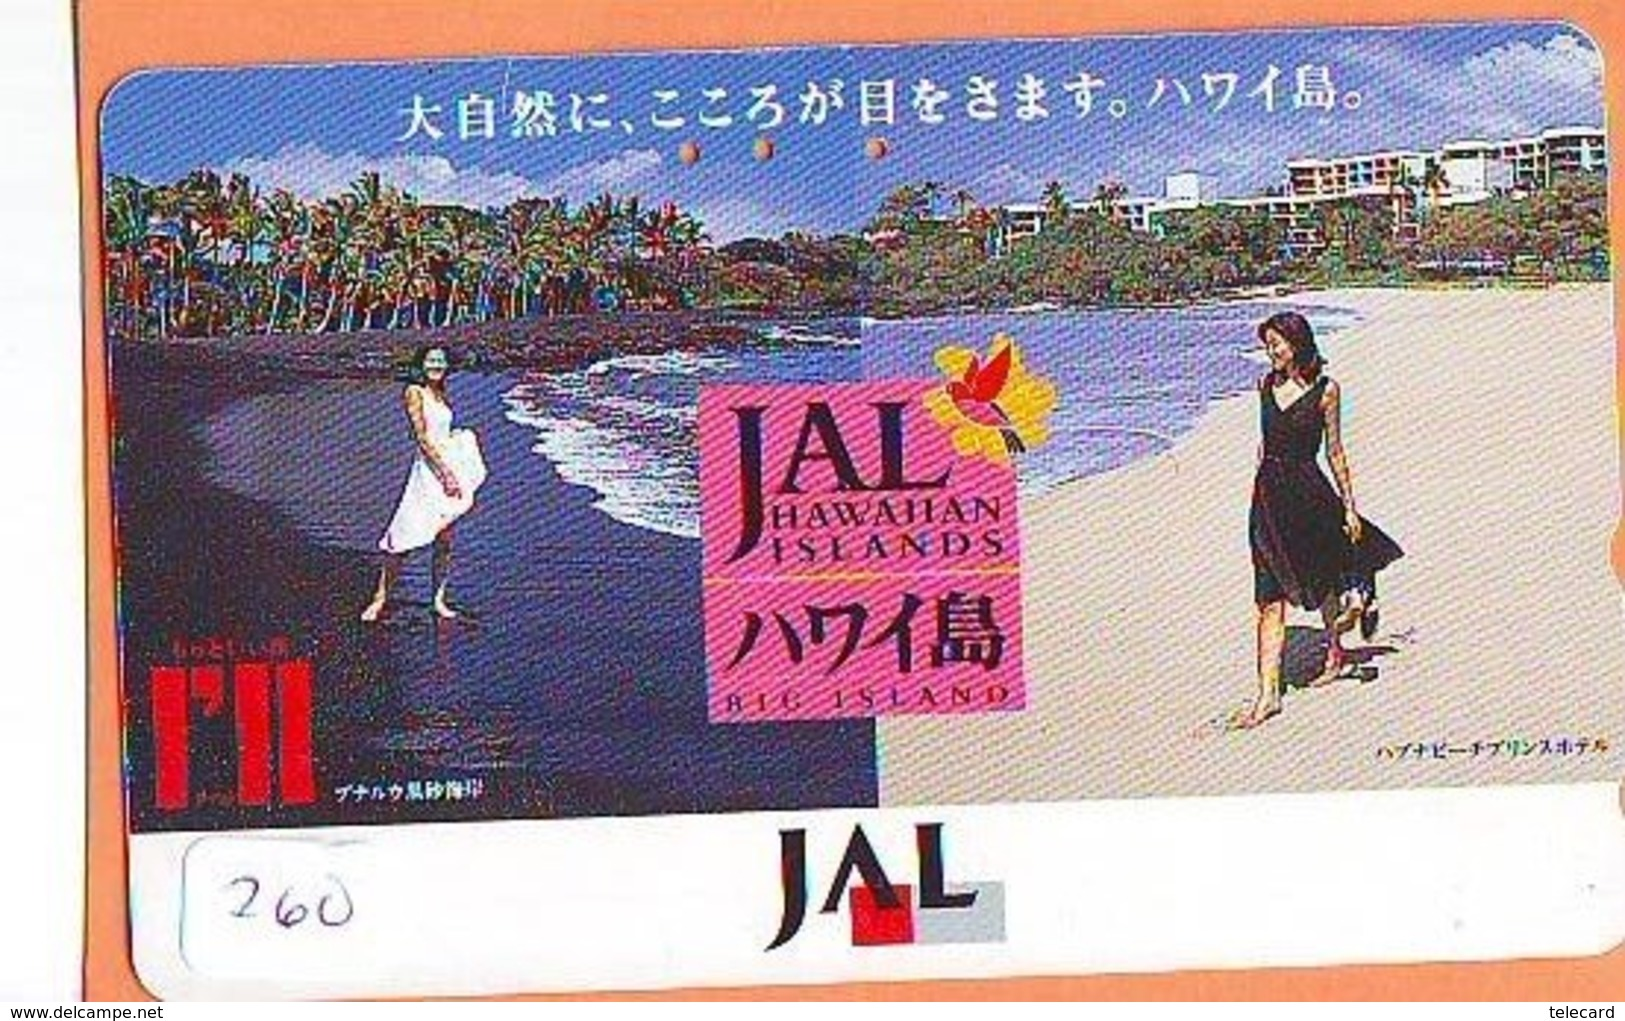 Télécarte HAWAII Sur JAPON * HAWAII Related (260)  FEMMES * JAL * Telefonkarte *  Phonecard Japan - - Paisajes